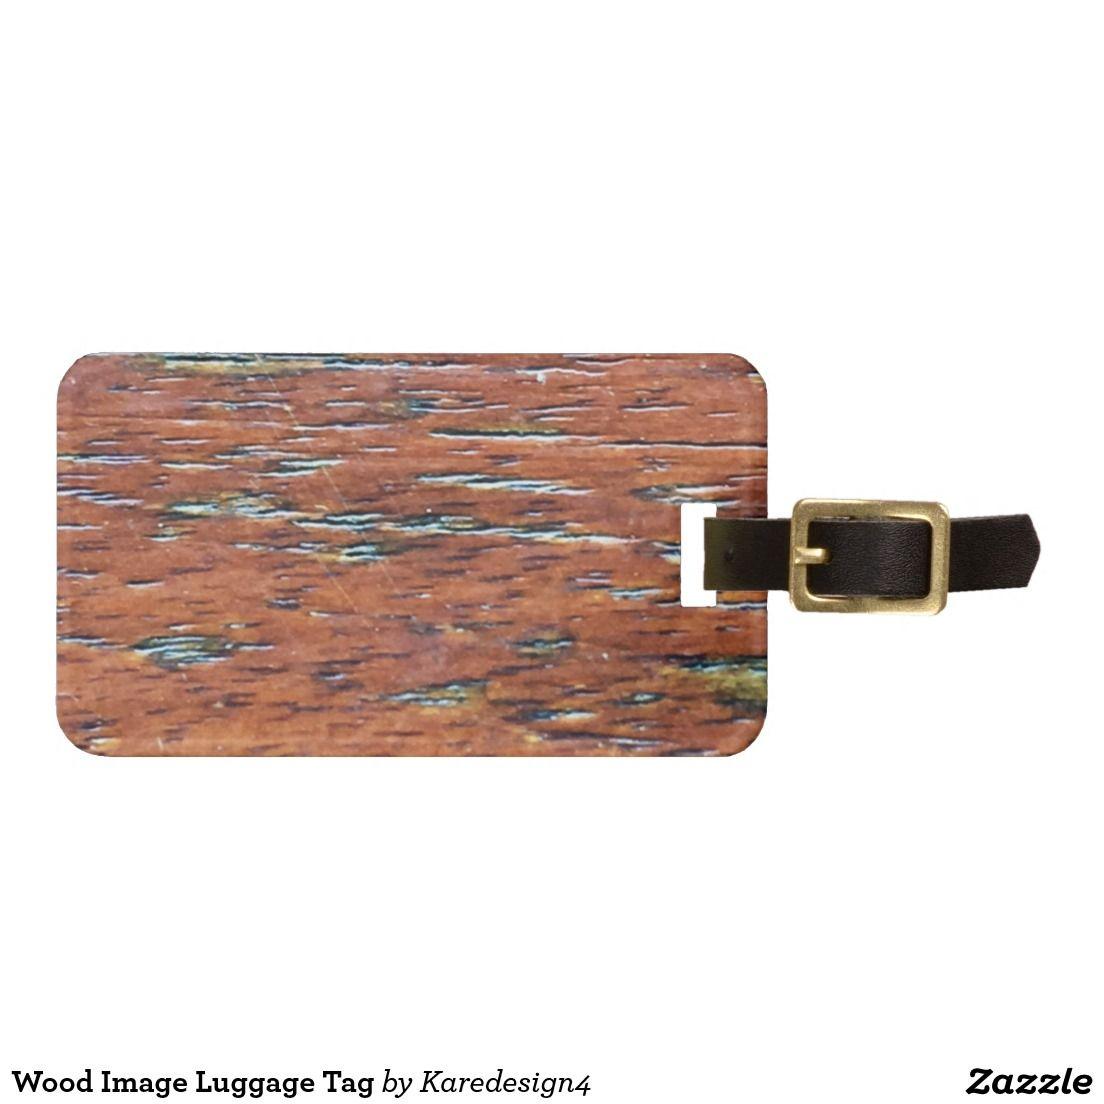 Wood Image Luggage Tag